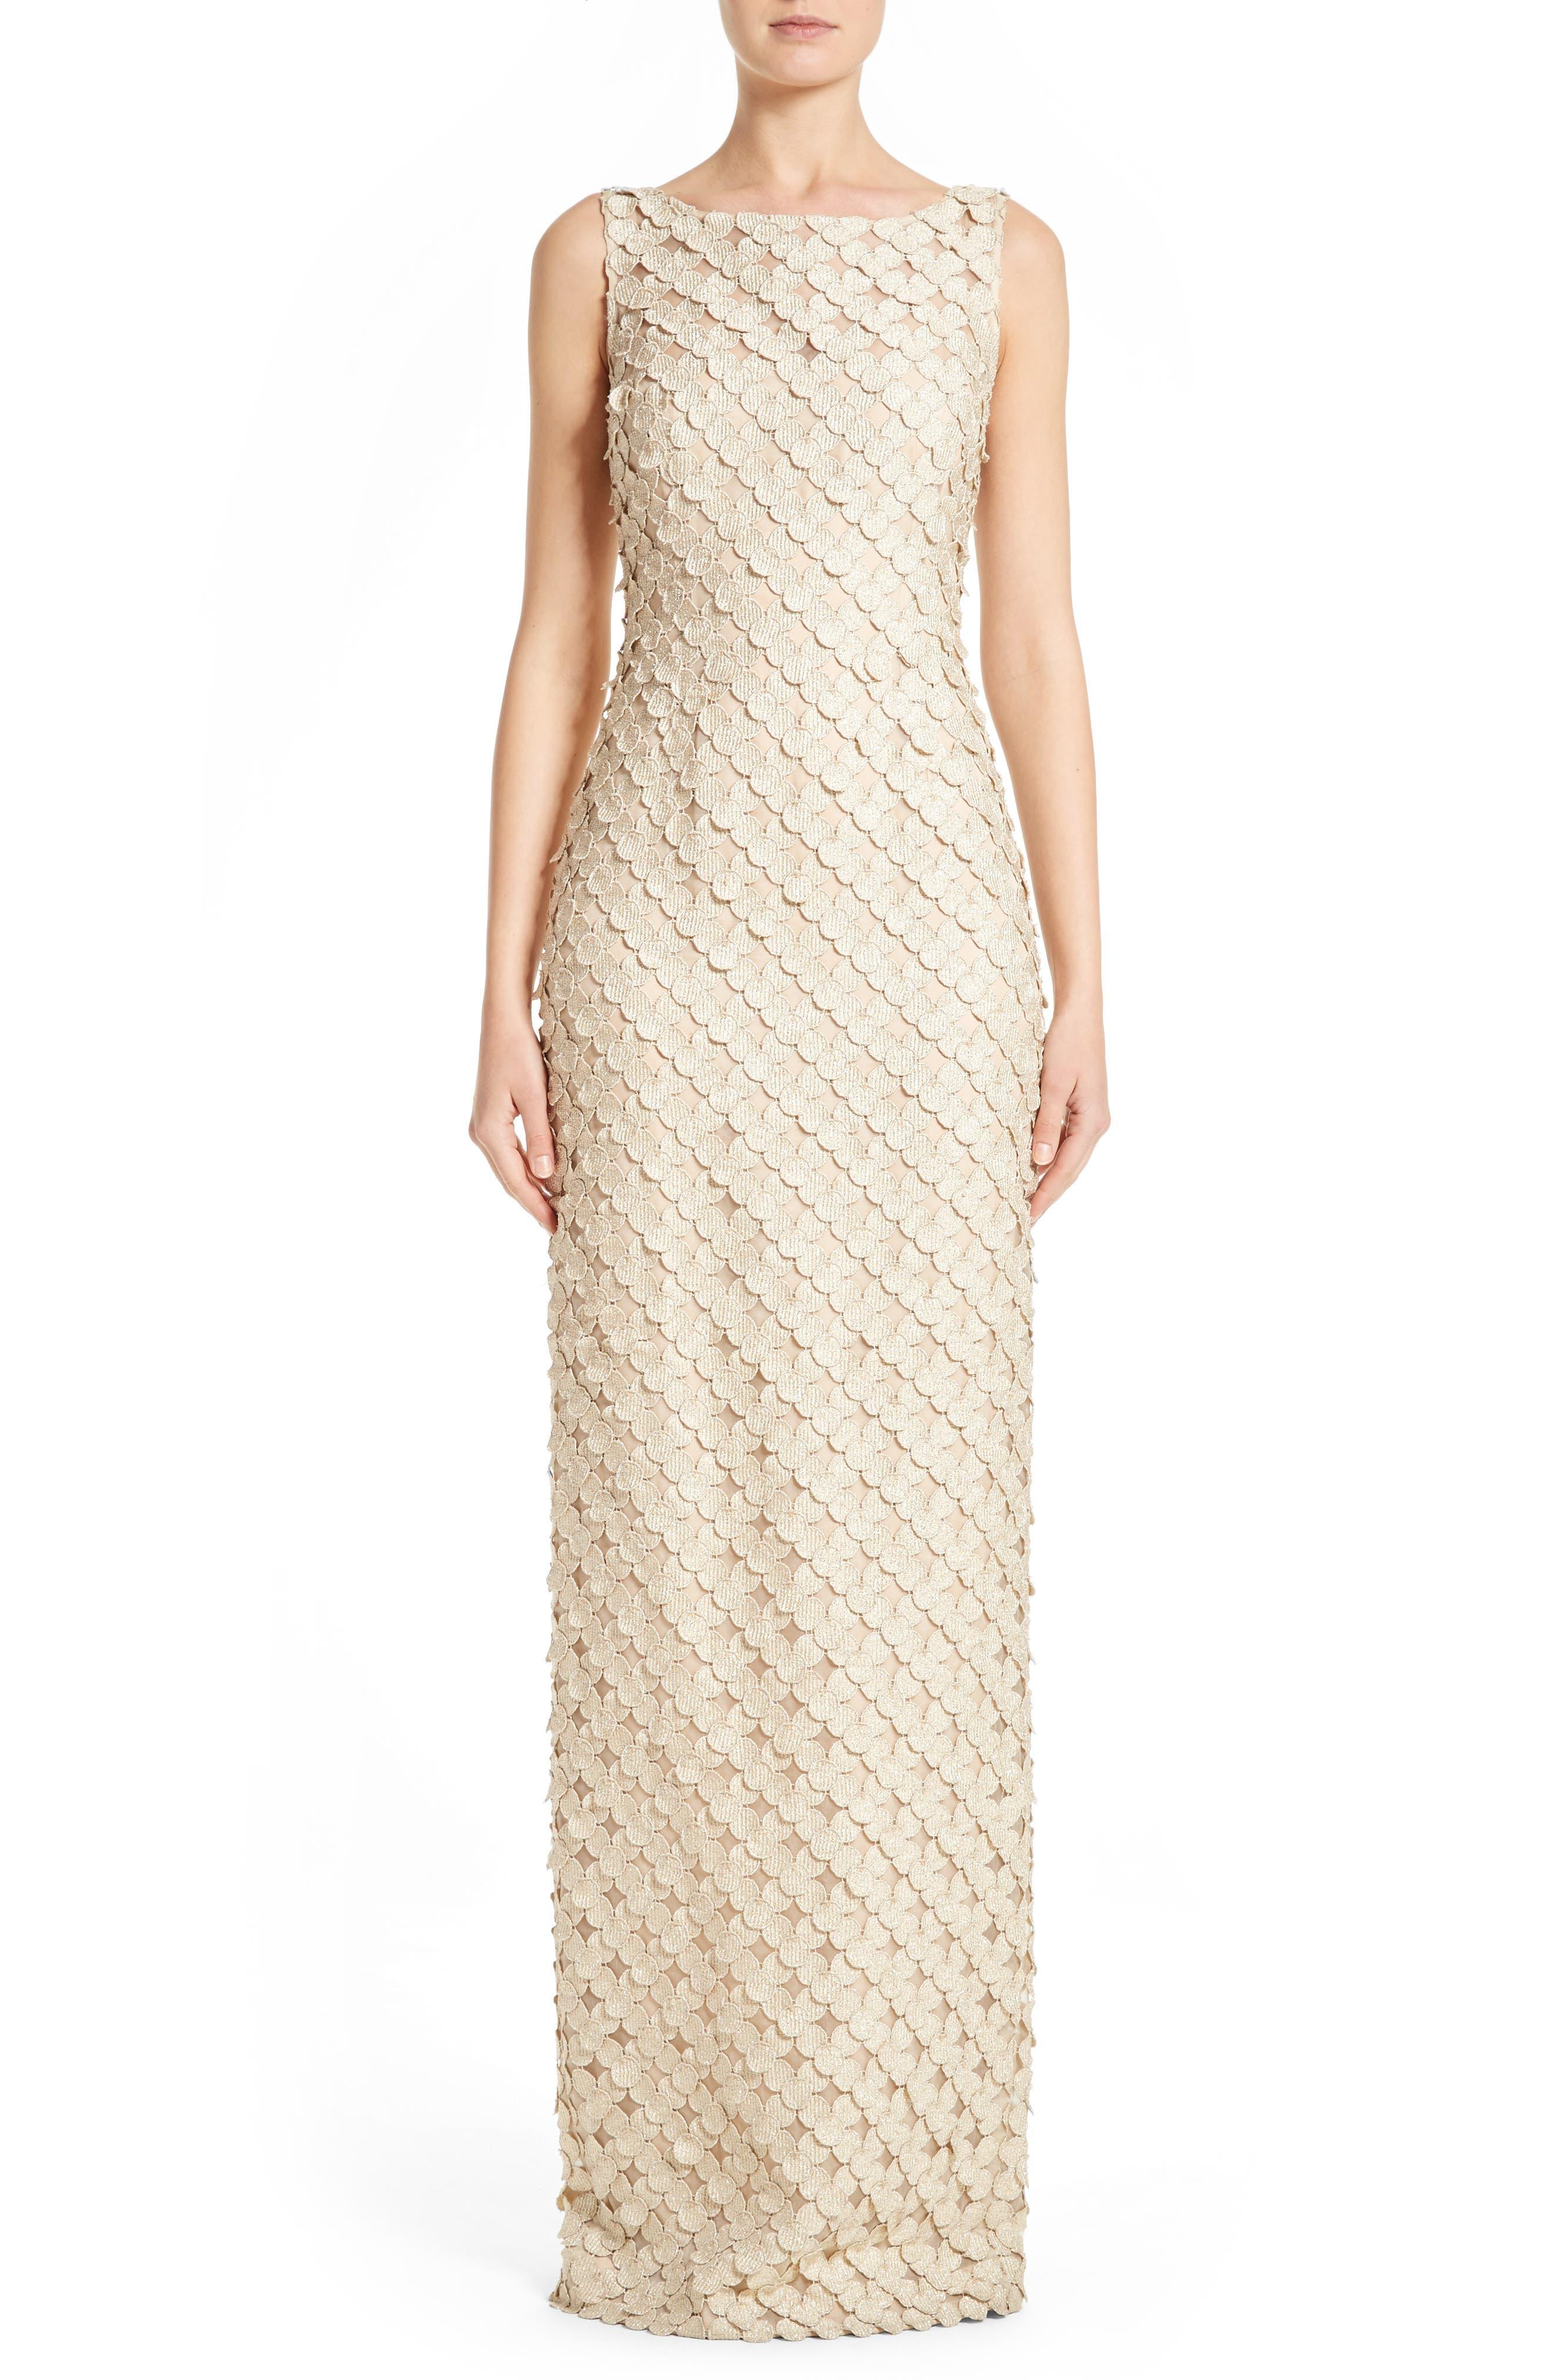 Alternate Image 1 Selected - Carmen Marc Valvo Couture Circle Appliqué Sleeveless Column Gown